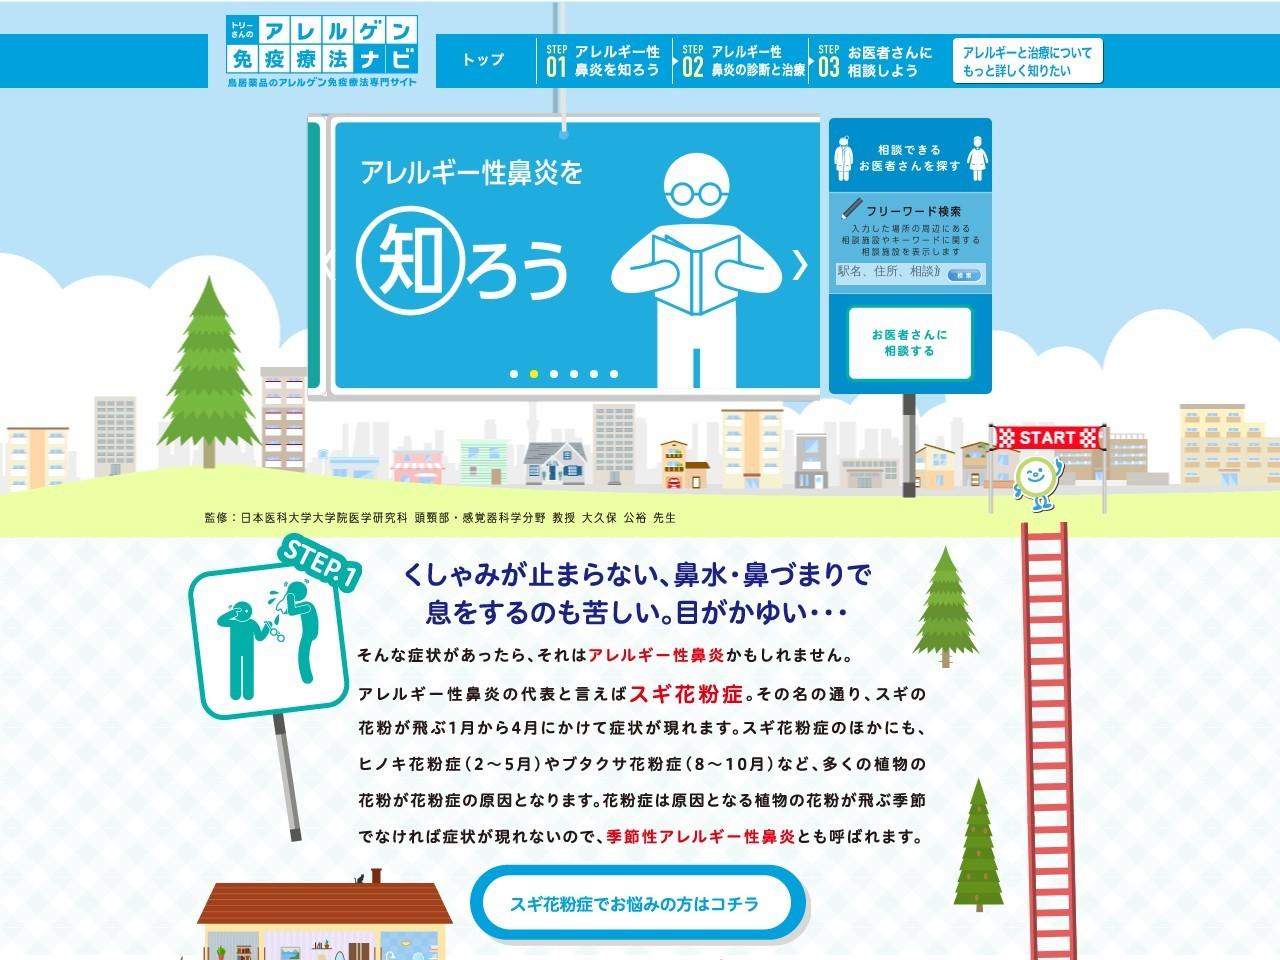 https://www.torii-alg.jp/LP_201602/